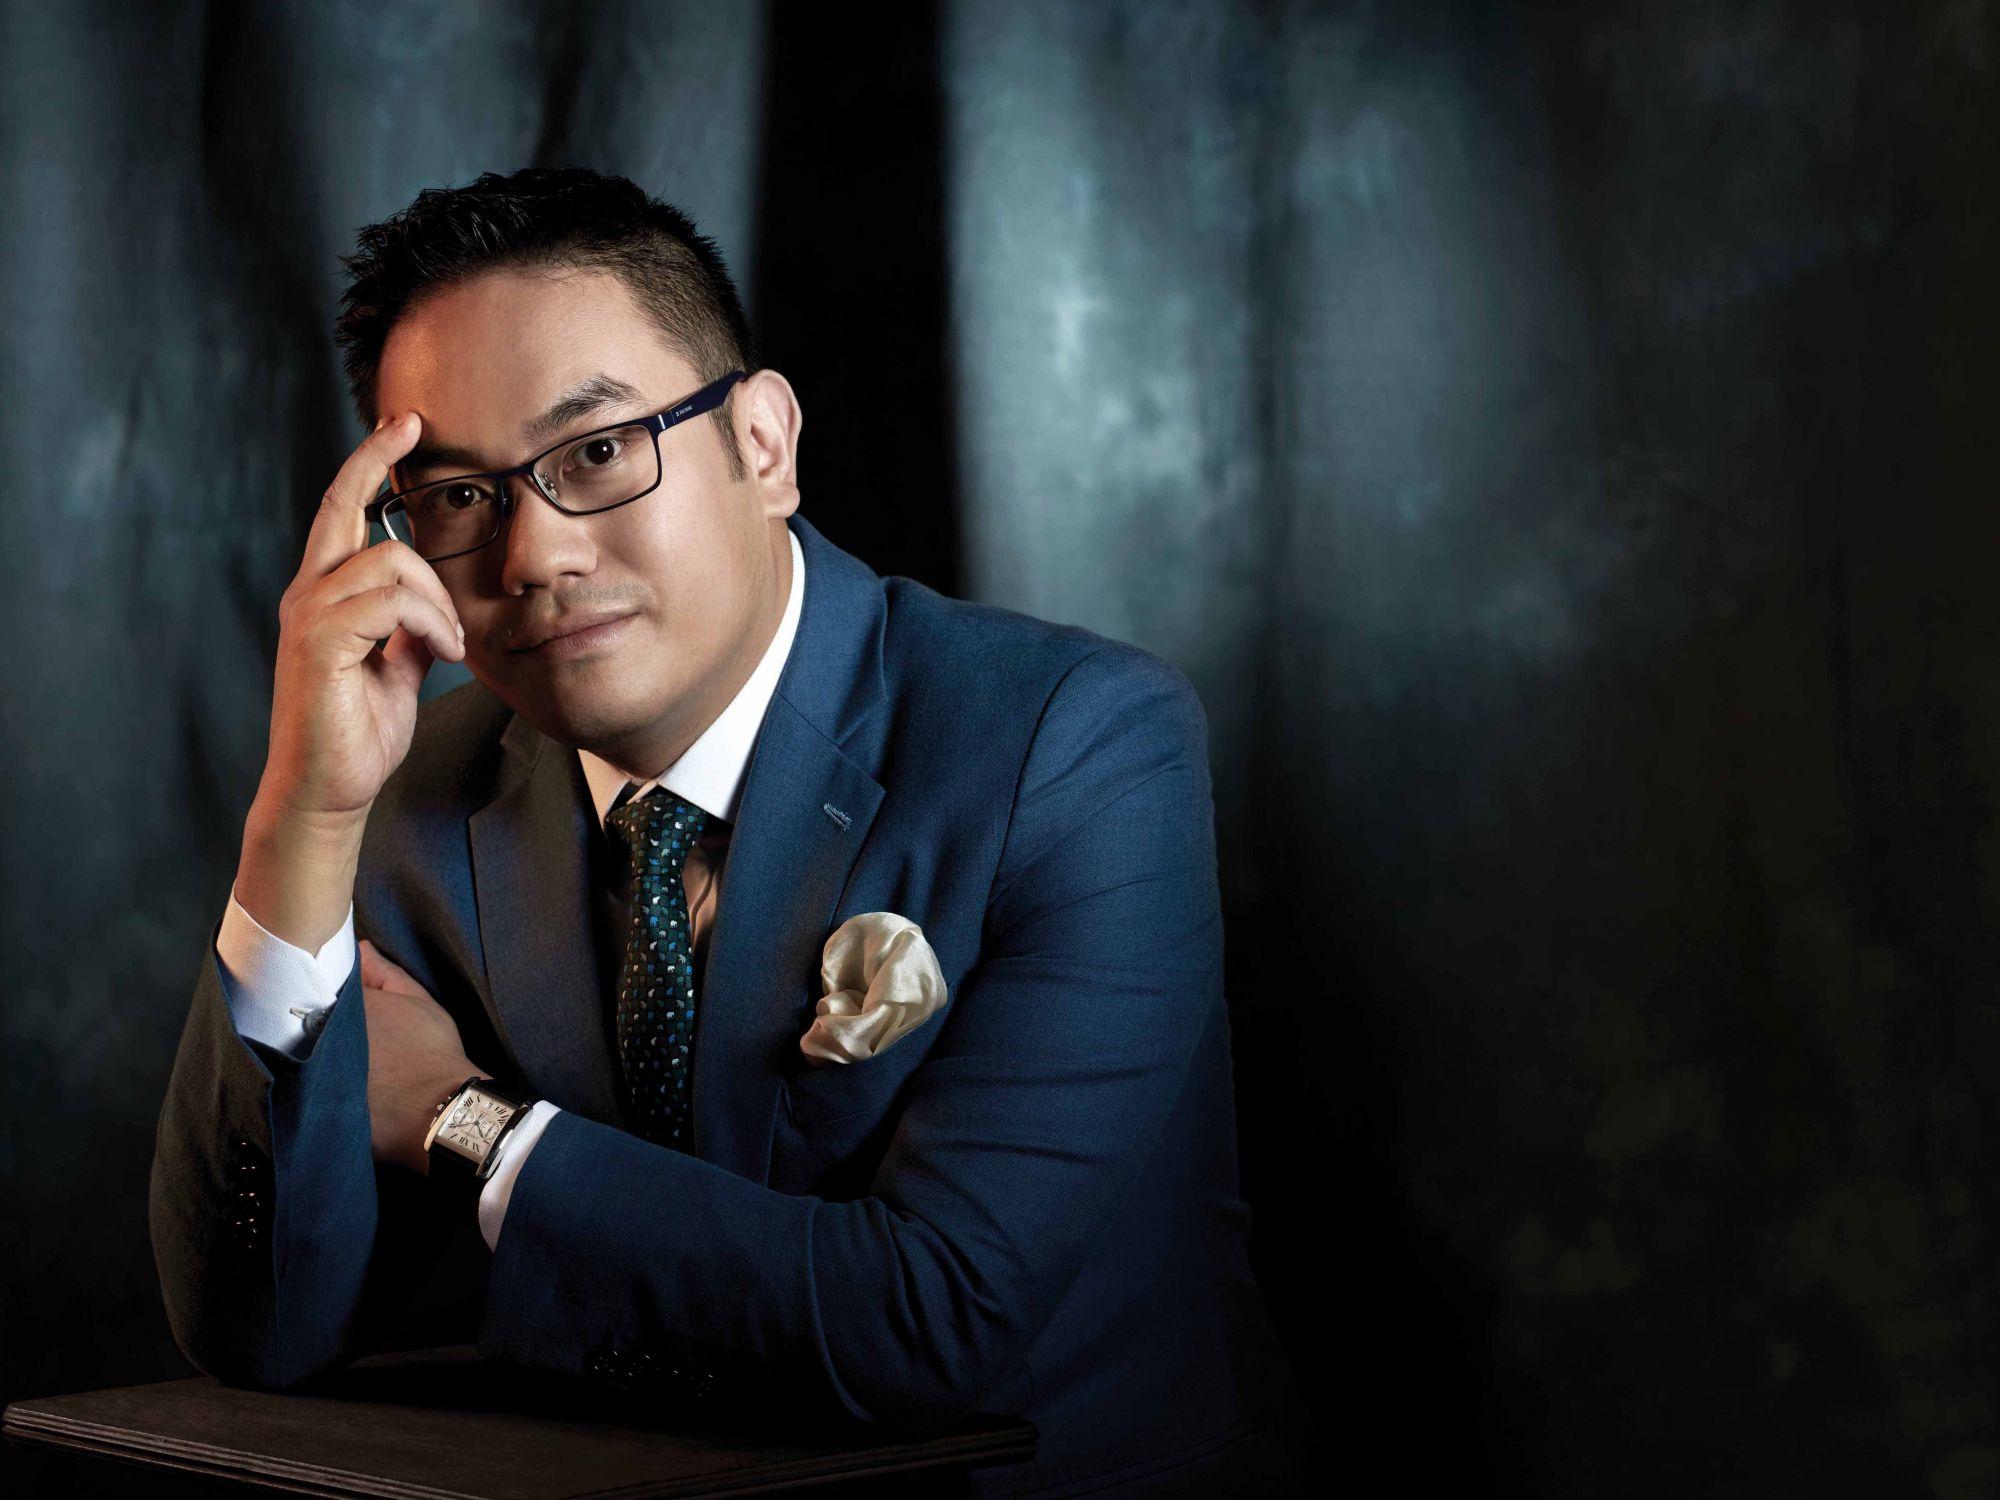 Meet Daryl Neo, Co-founder Of Handshakes